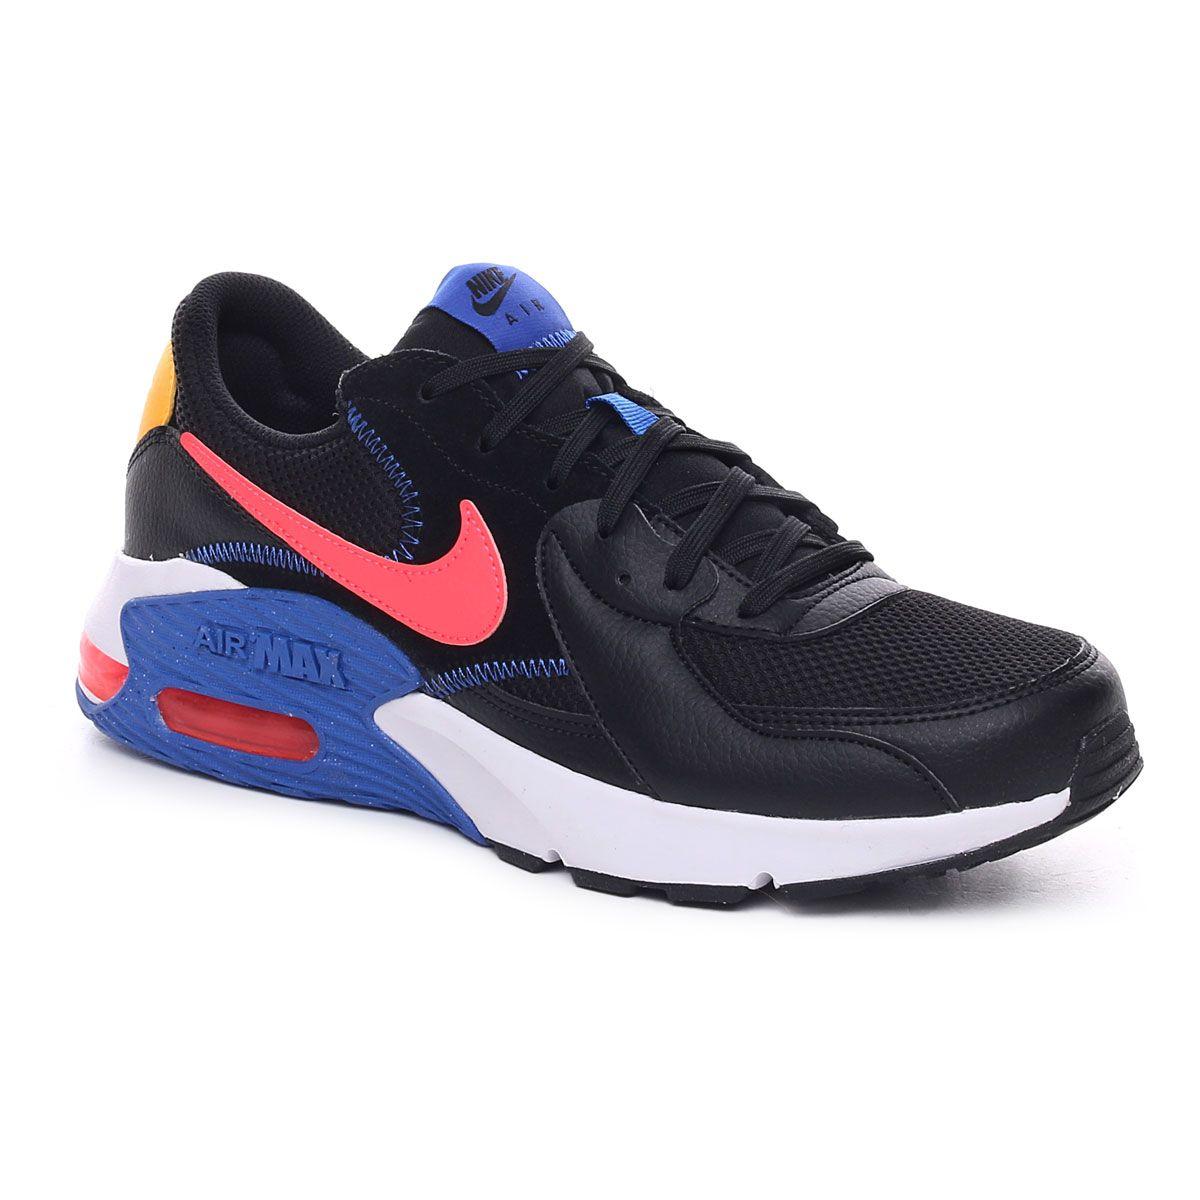 Nike Air Max Excee Uomo Nero Rosso